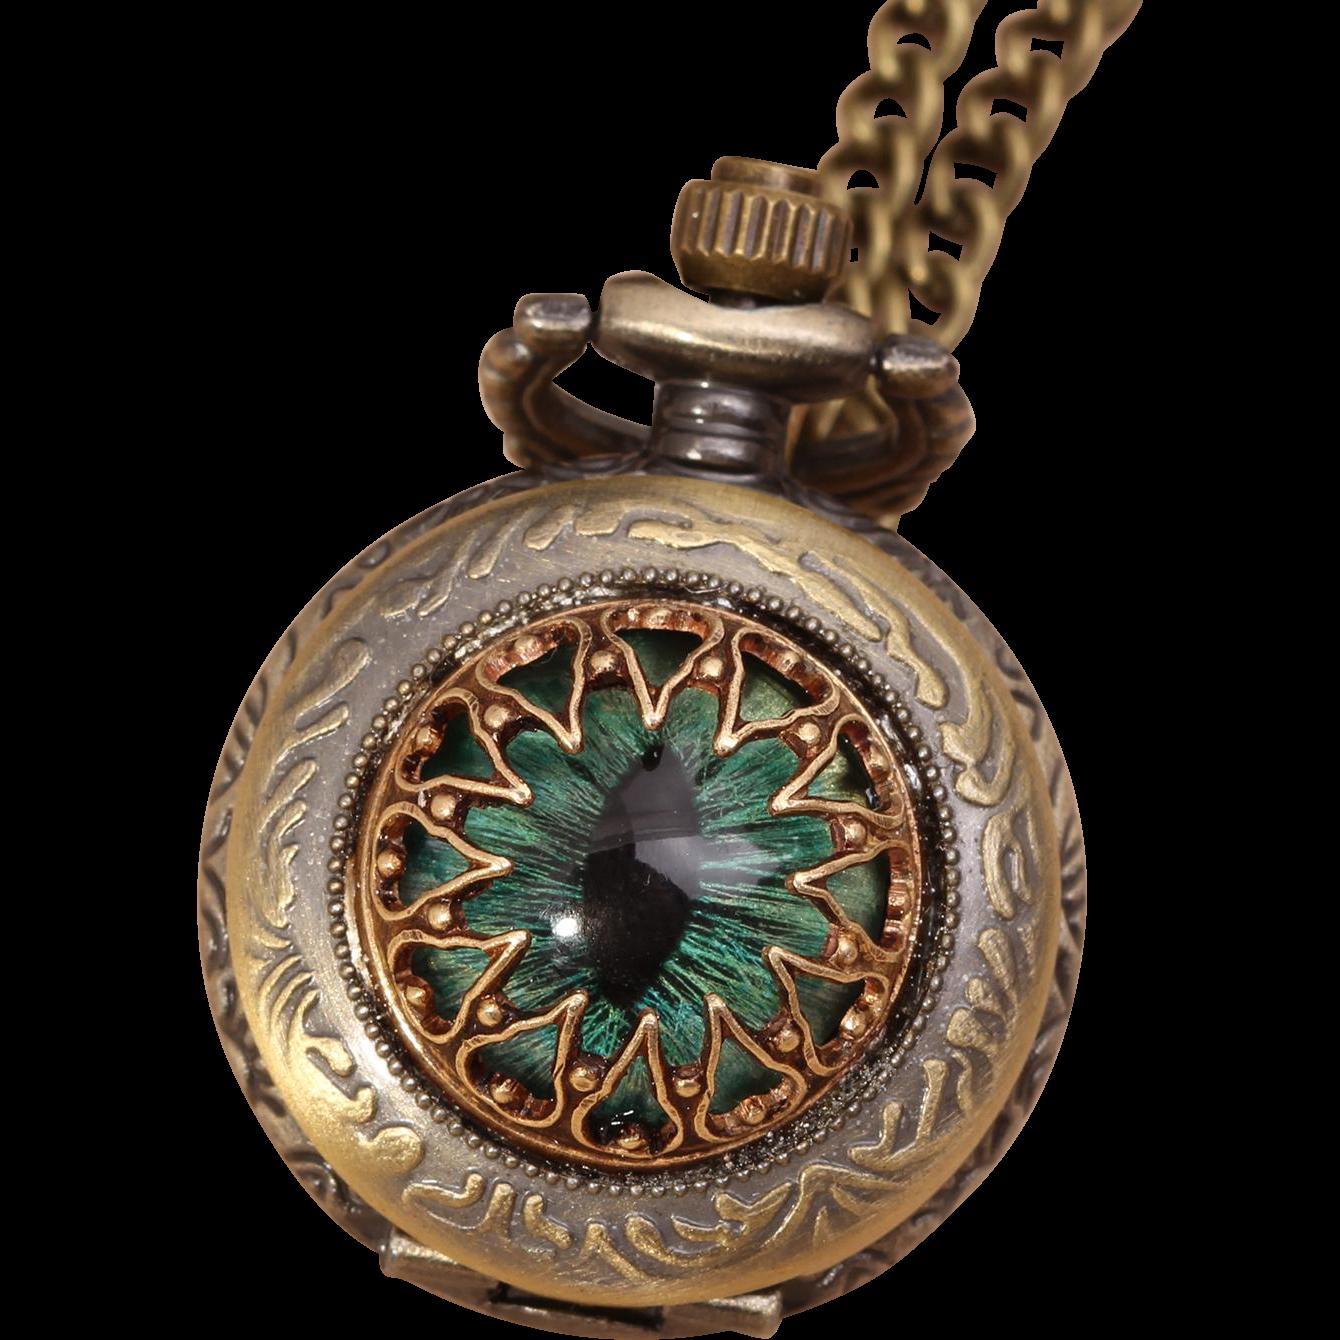 Dragon Eye Necklace Pocket Watch Necklace Eye Necklace Evil Eye Necklace Pocket Watch Working